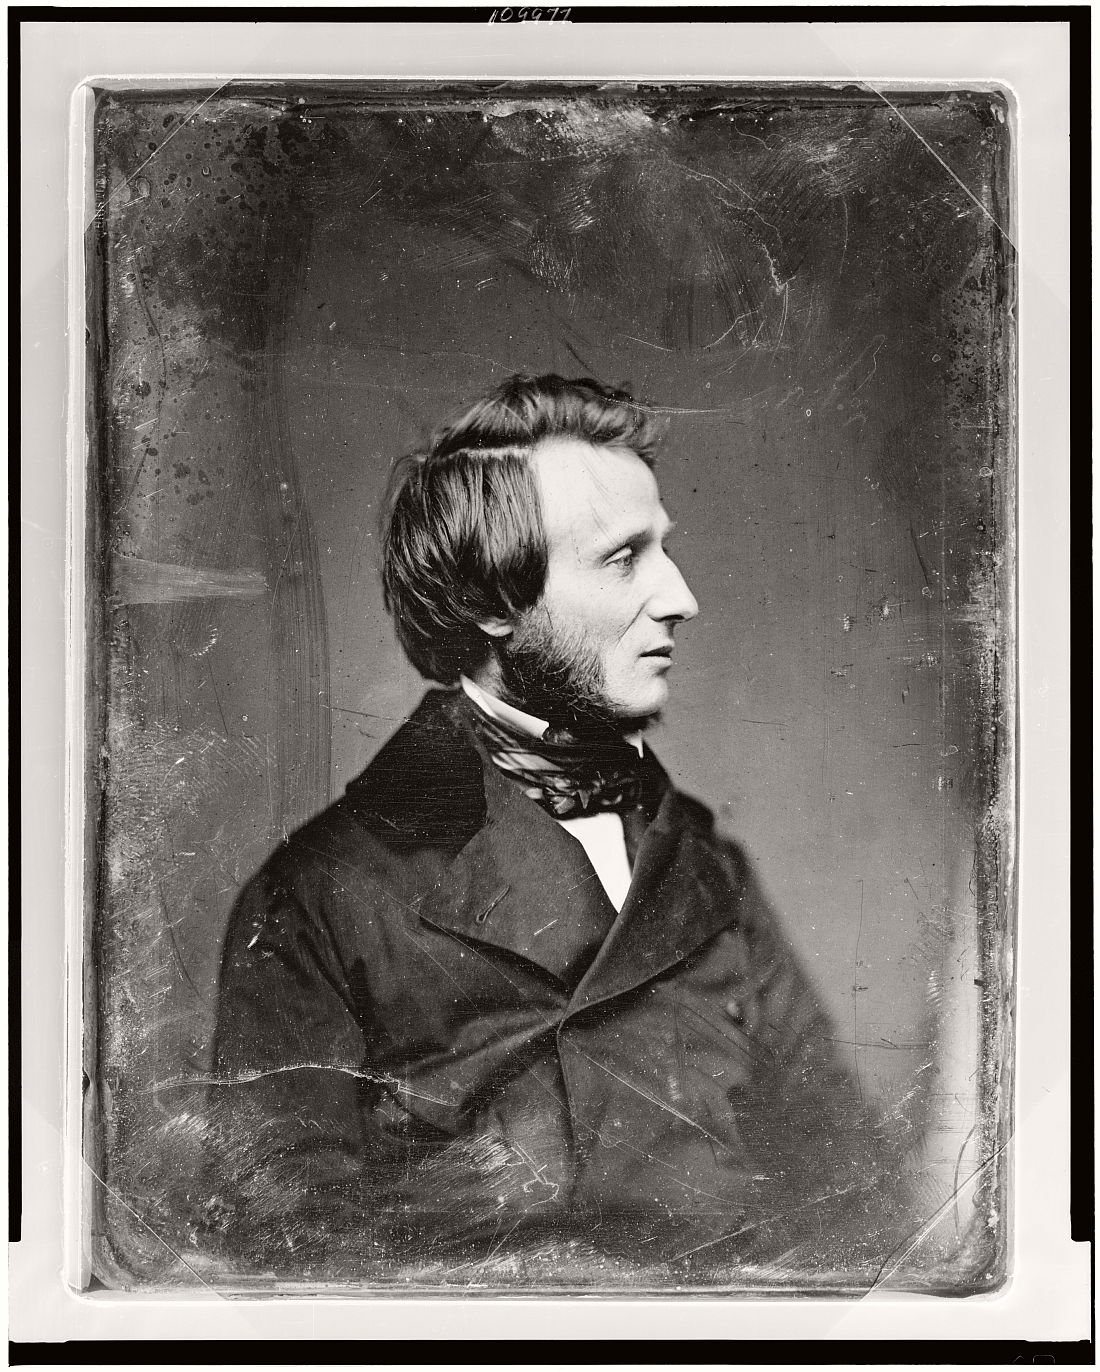 vintage-daguerreotype-portraits-from-xix-century-1844-1860-39